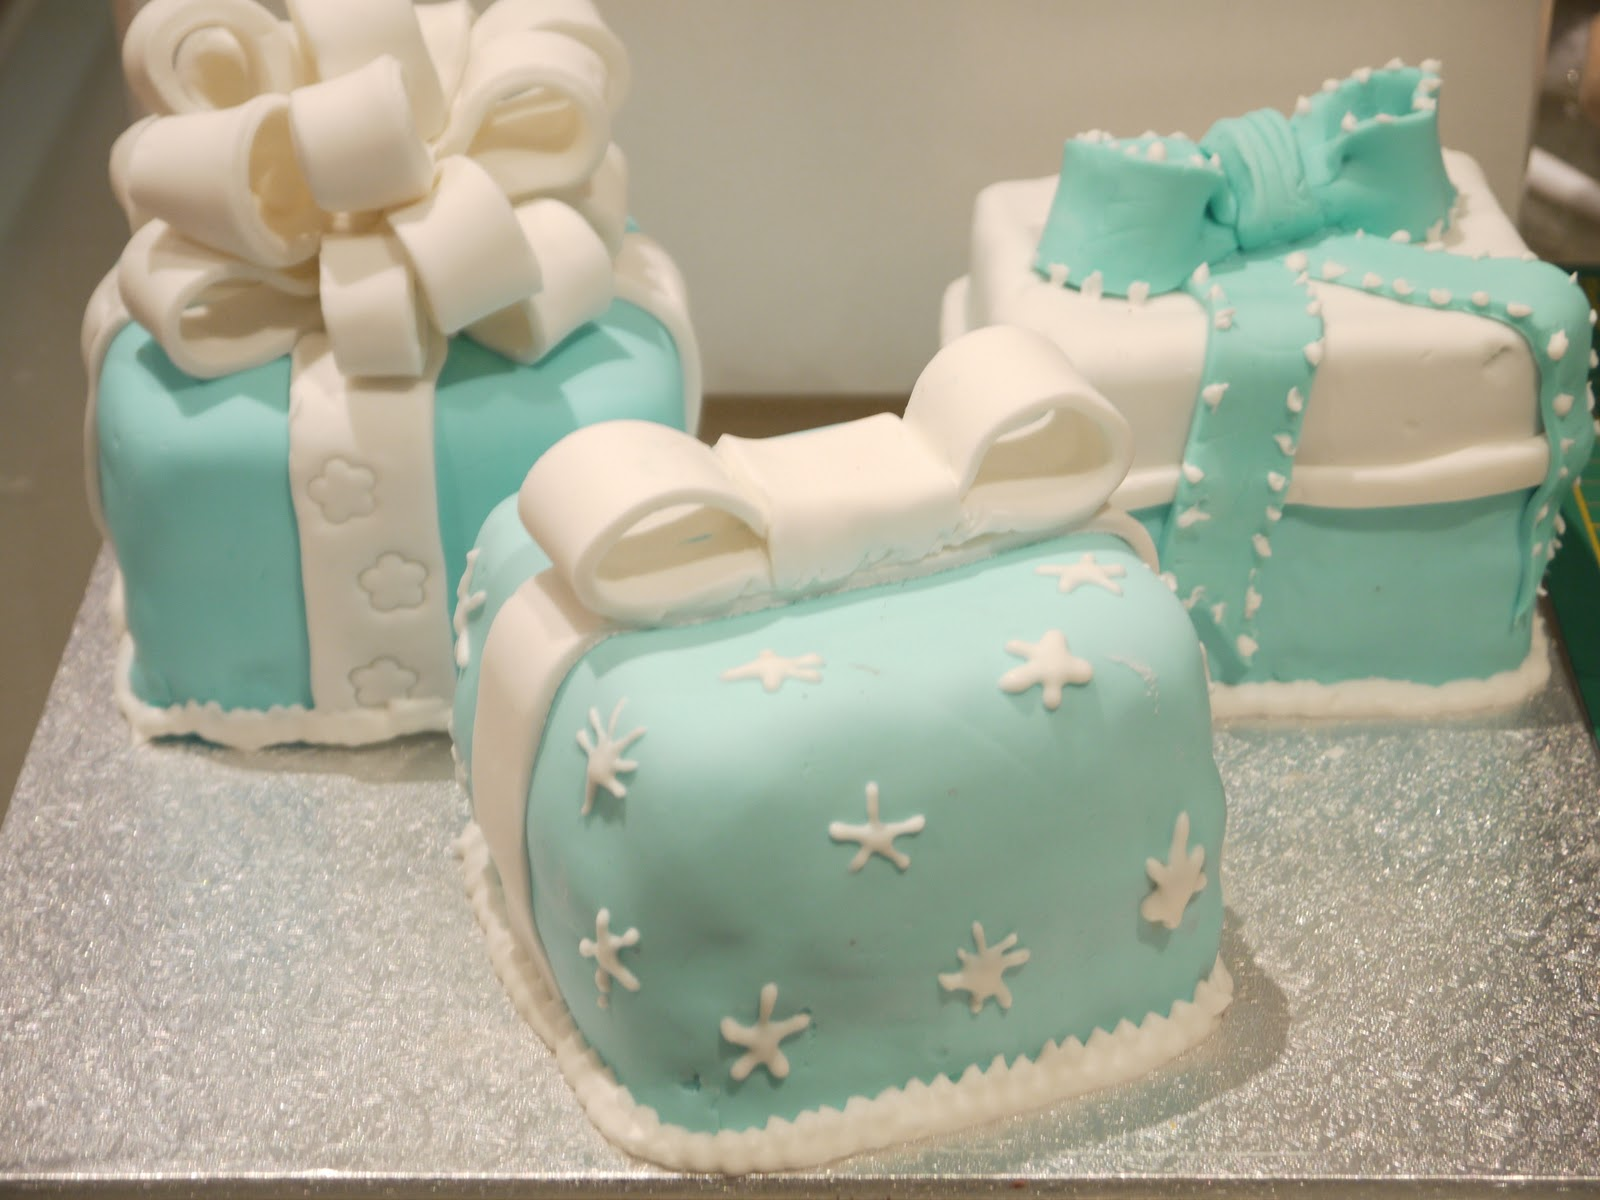 Sugar on top mini tiffany gift box cakes mini tiffany gift box cakes negle Images